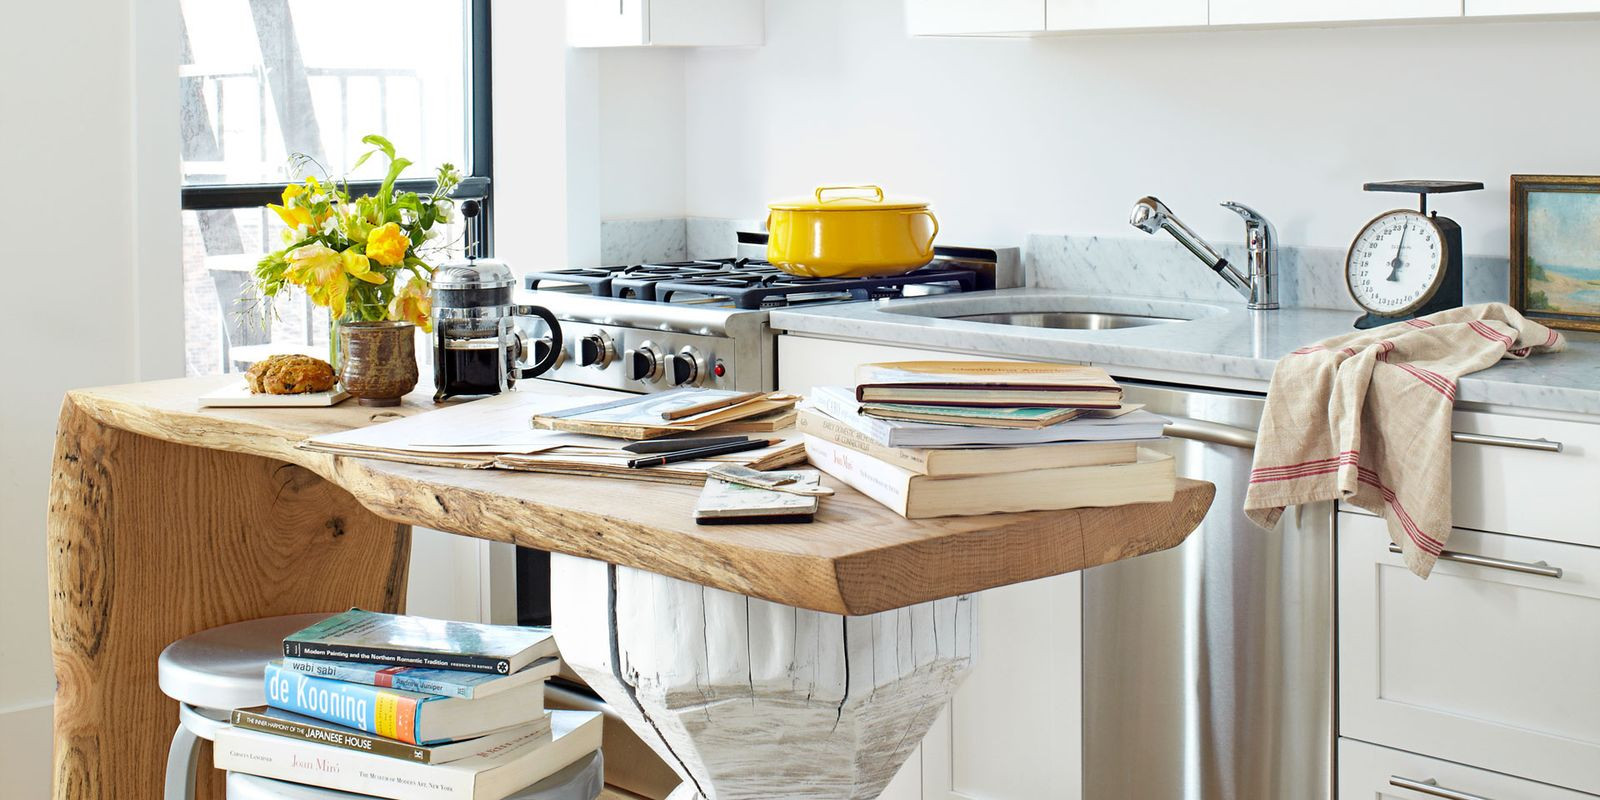 Best ideas about Studio Apartment Kitchen Ideas . Save or Pin Studio Apartment Kitchen Ideas Now.